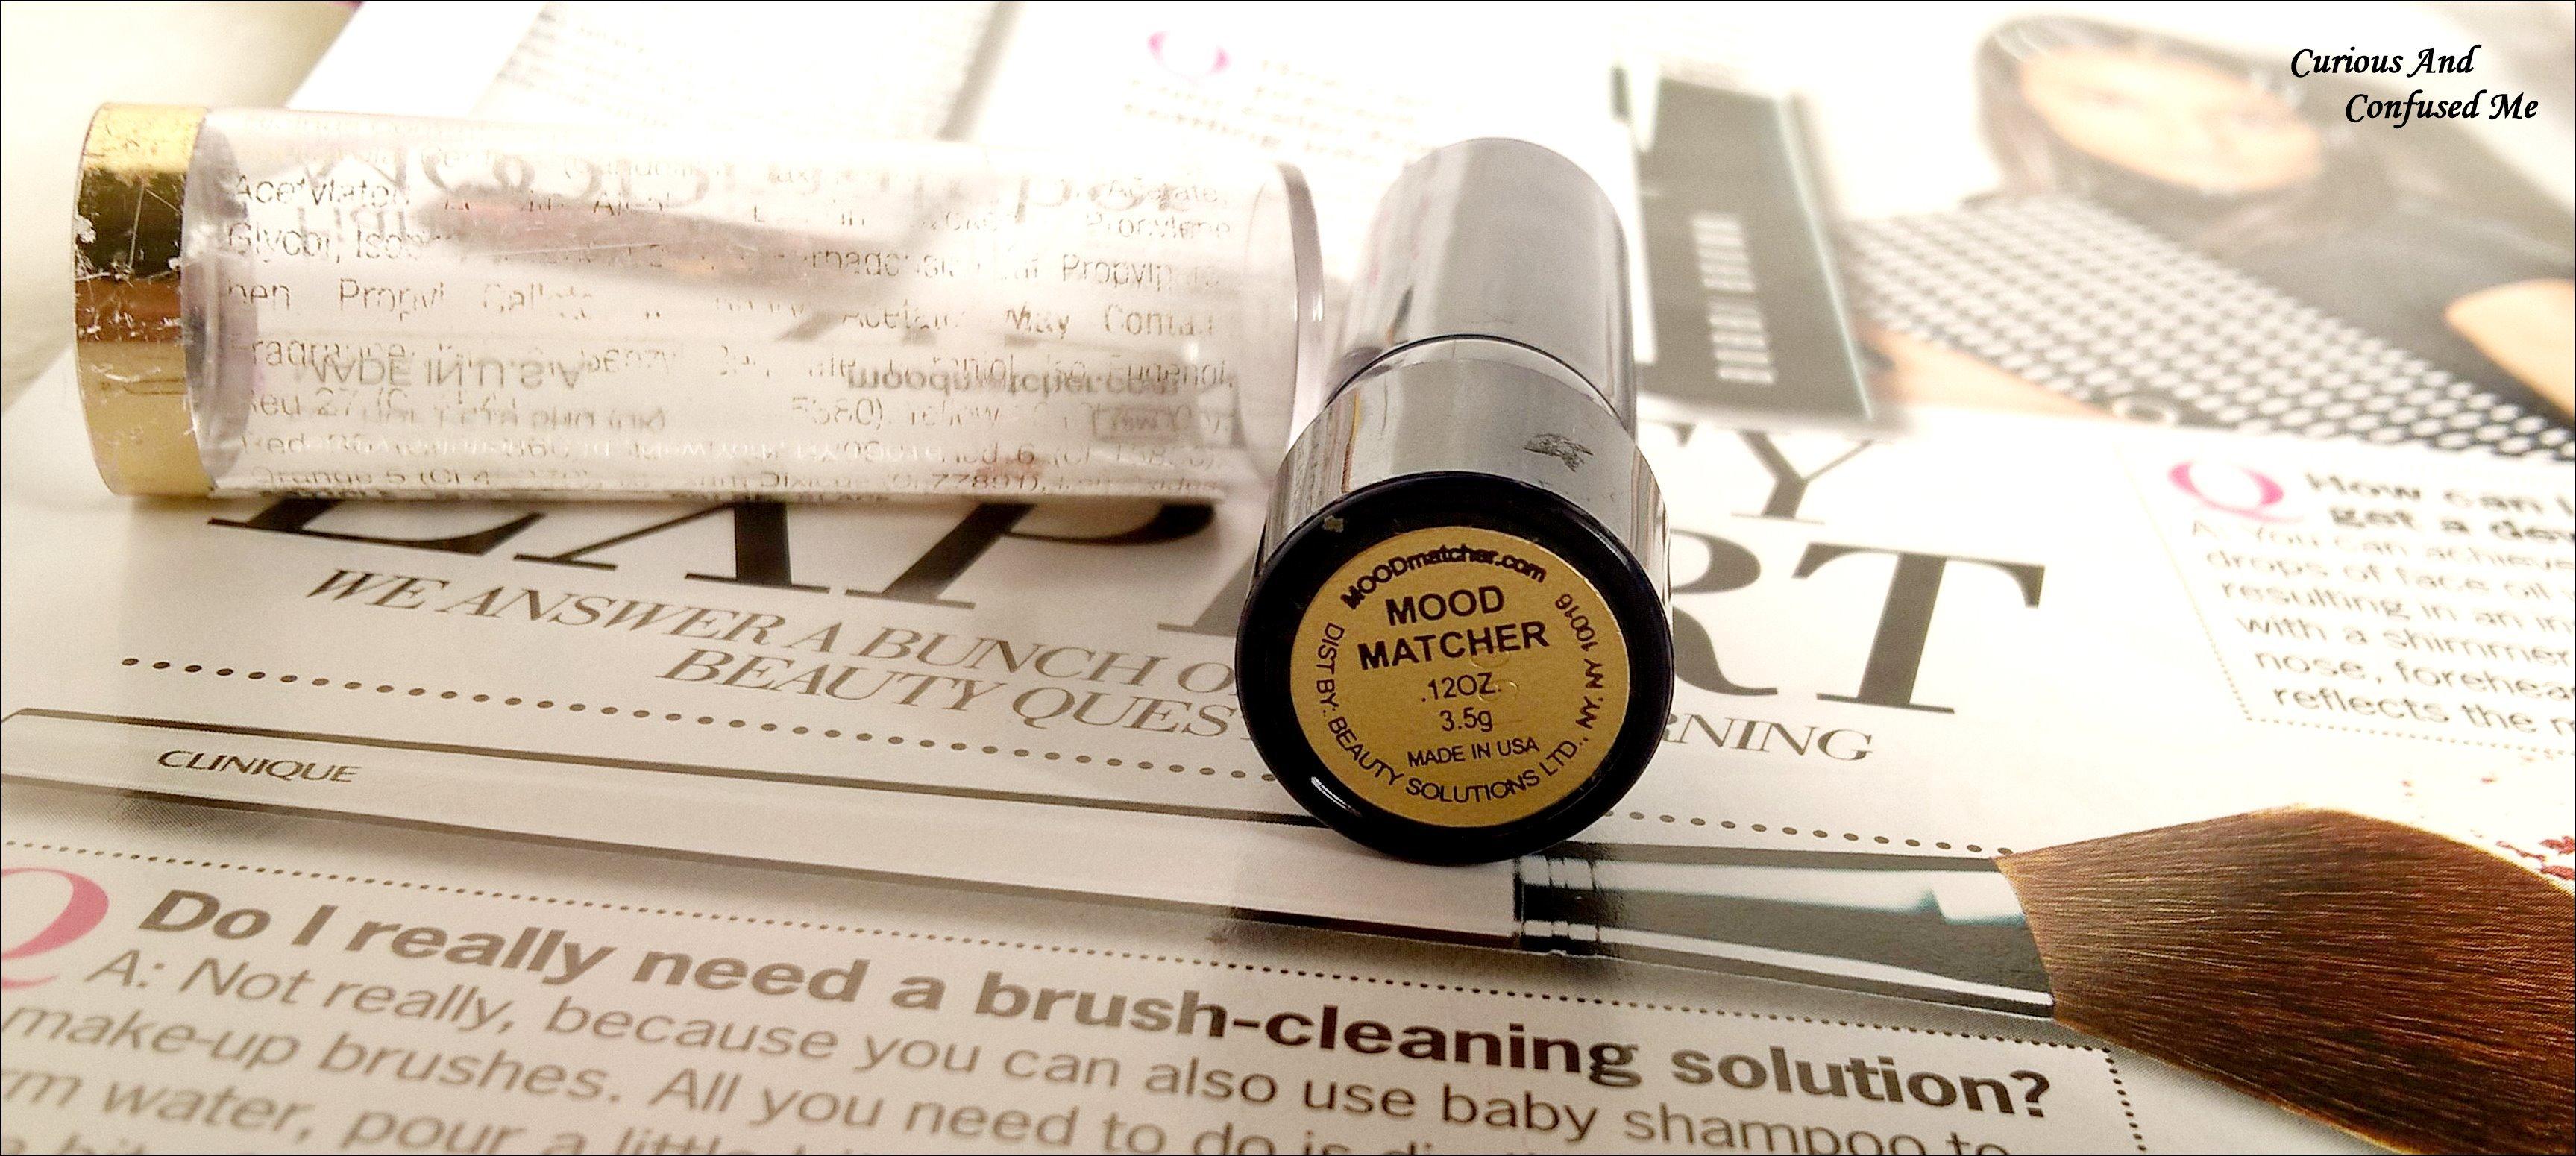 Fran Wilson Mood Matcher Lipstick Black Reviewlotd Curious And Moodmatcher Liquid Matte Just Blush Review Shade